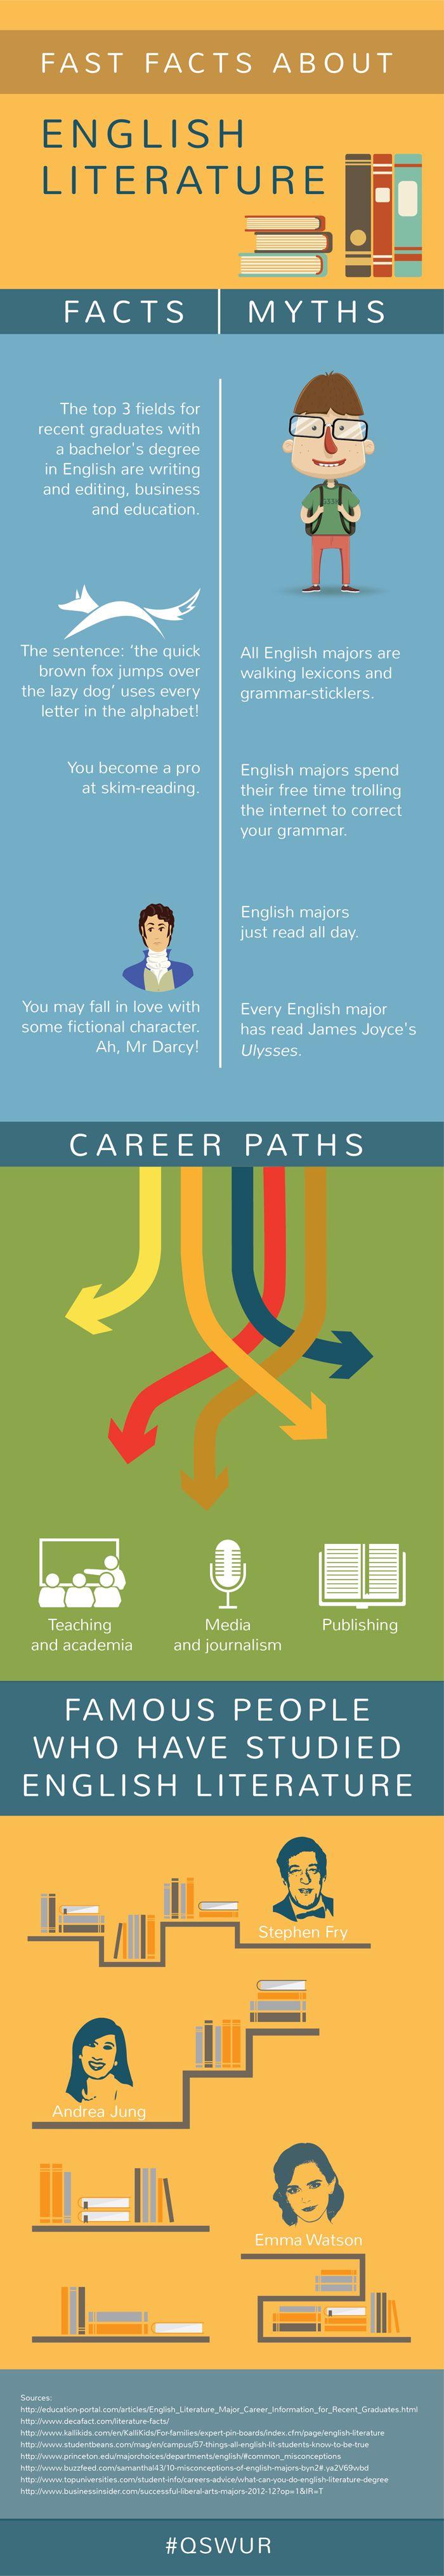 english literature major jobs